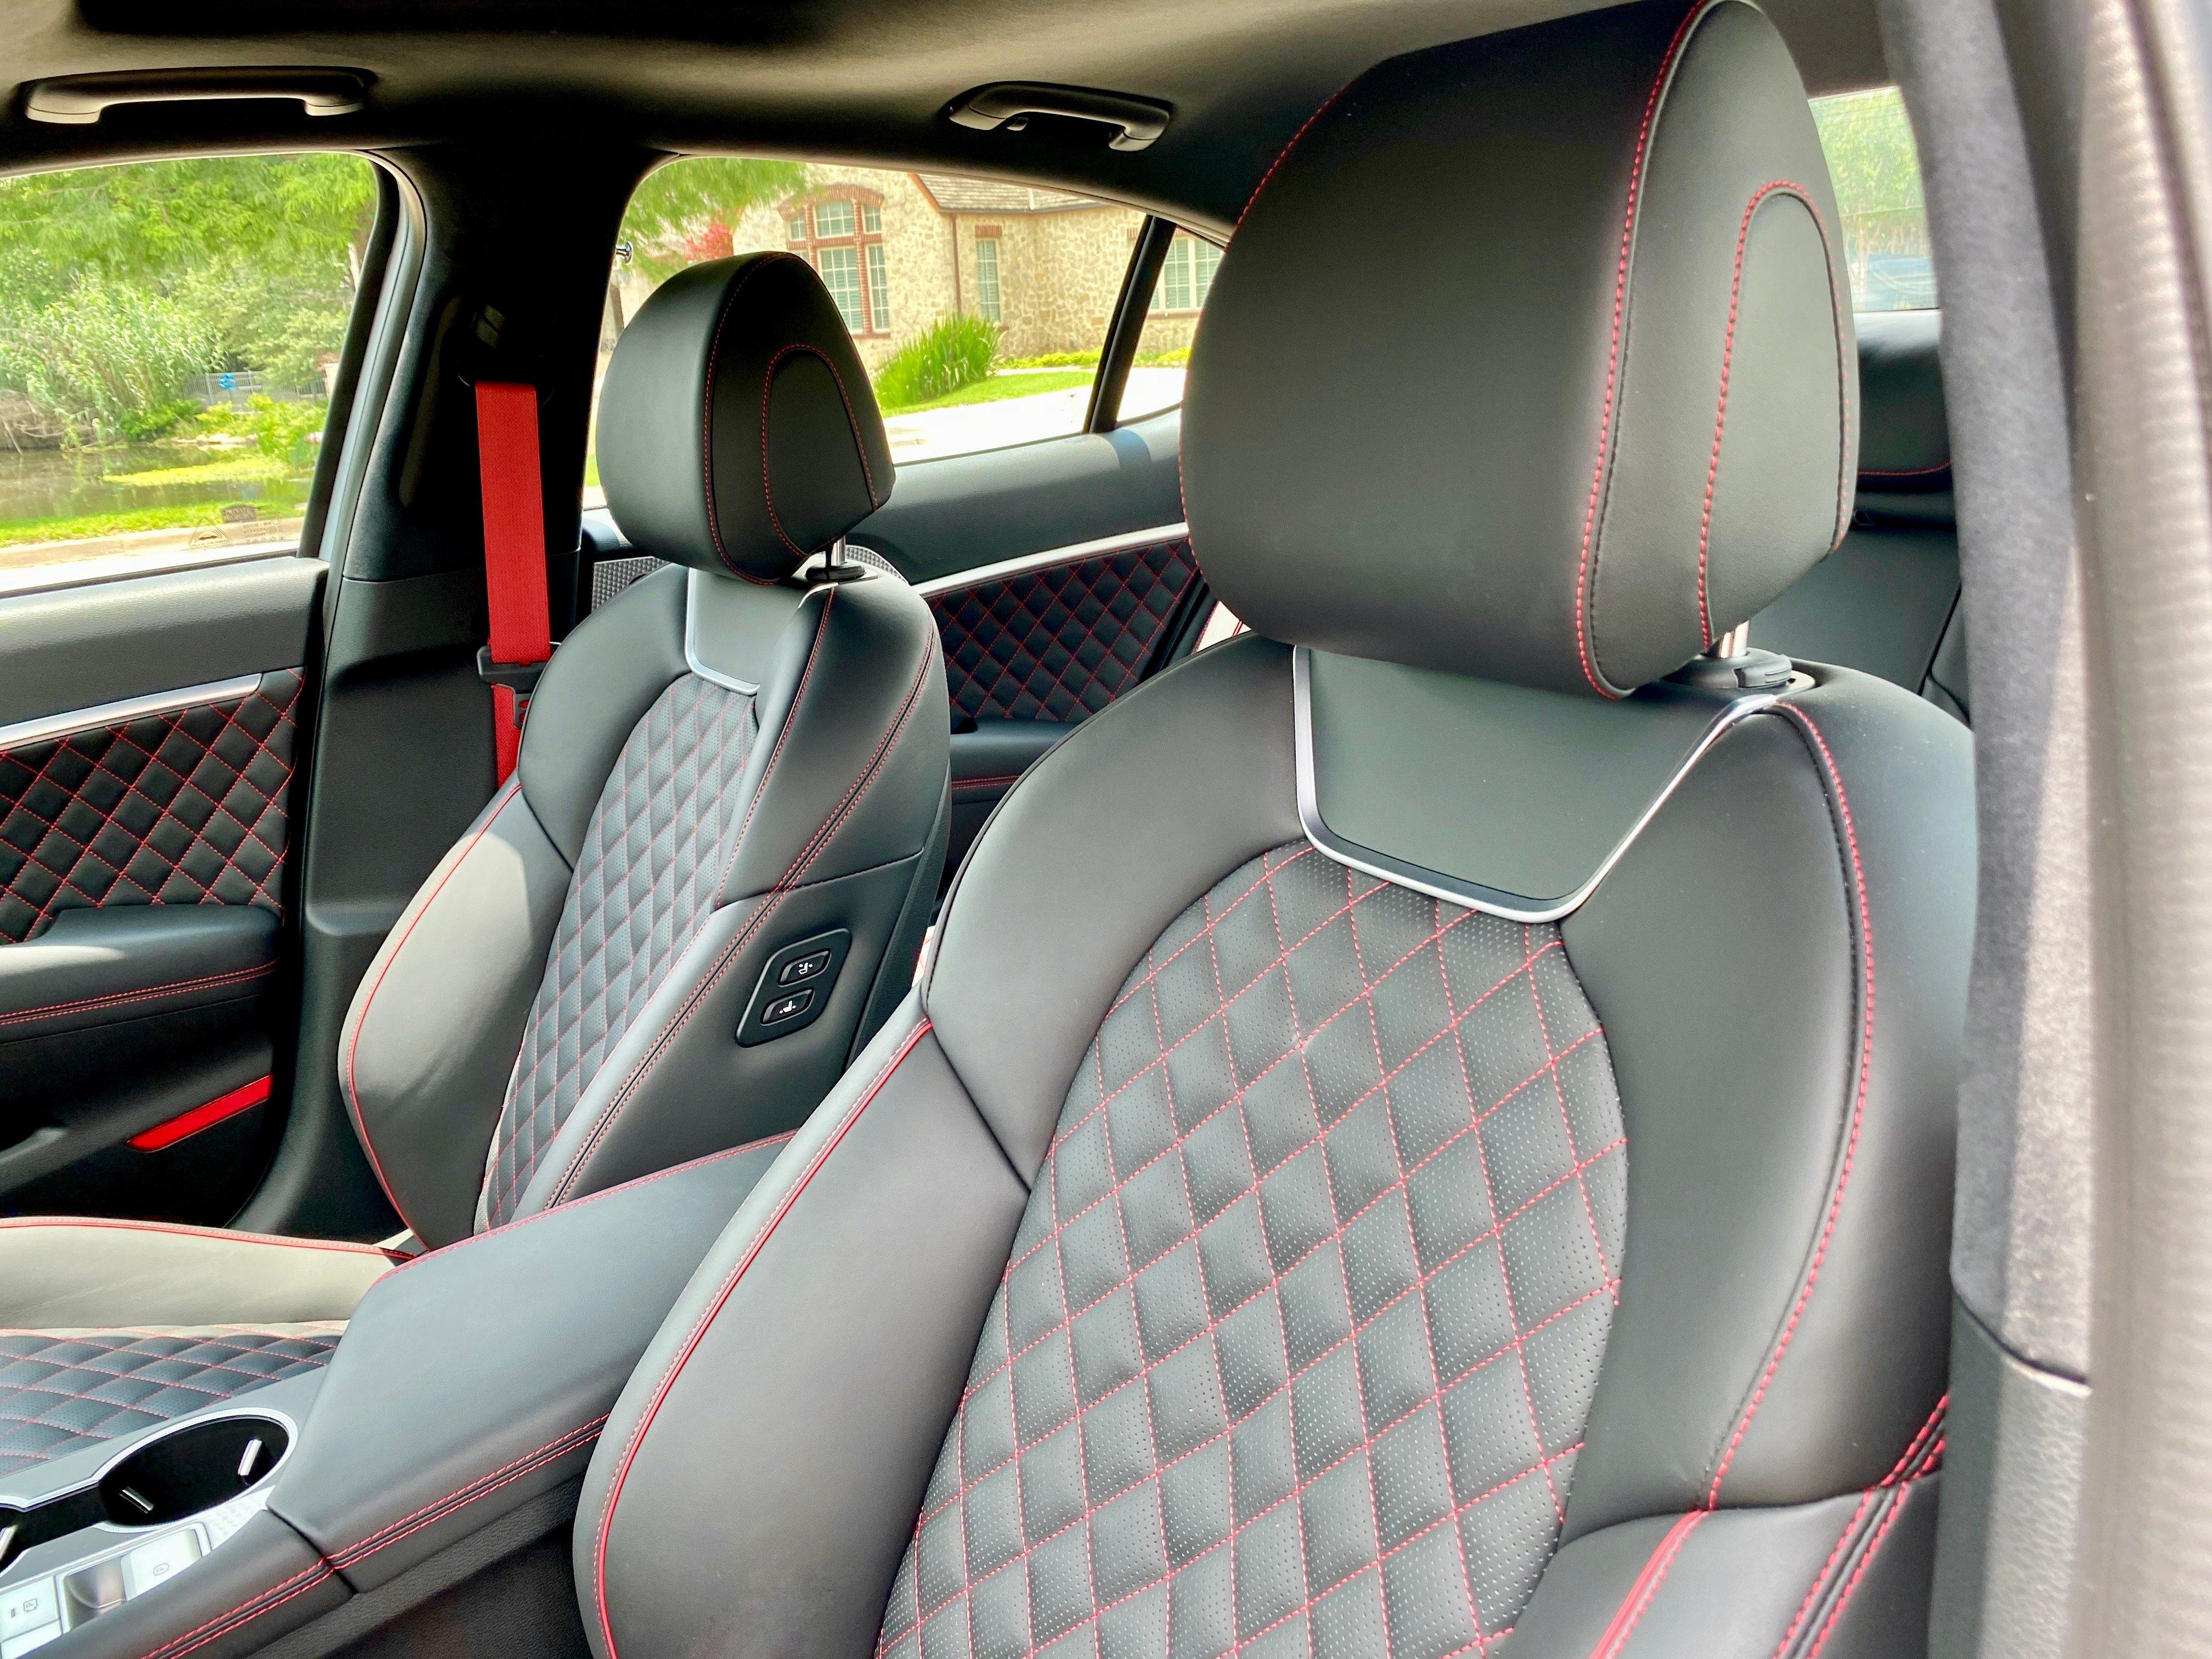 2022-genesis-g70-33t-driver-seat-carprousa